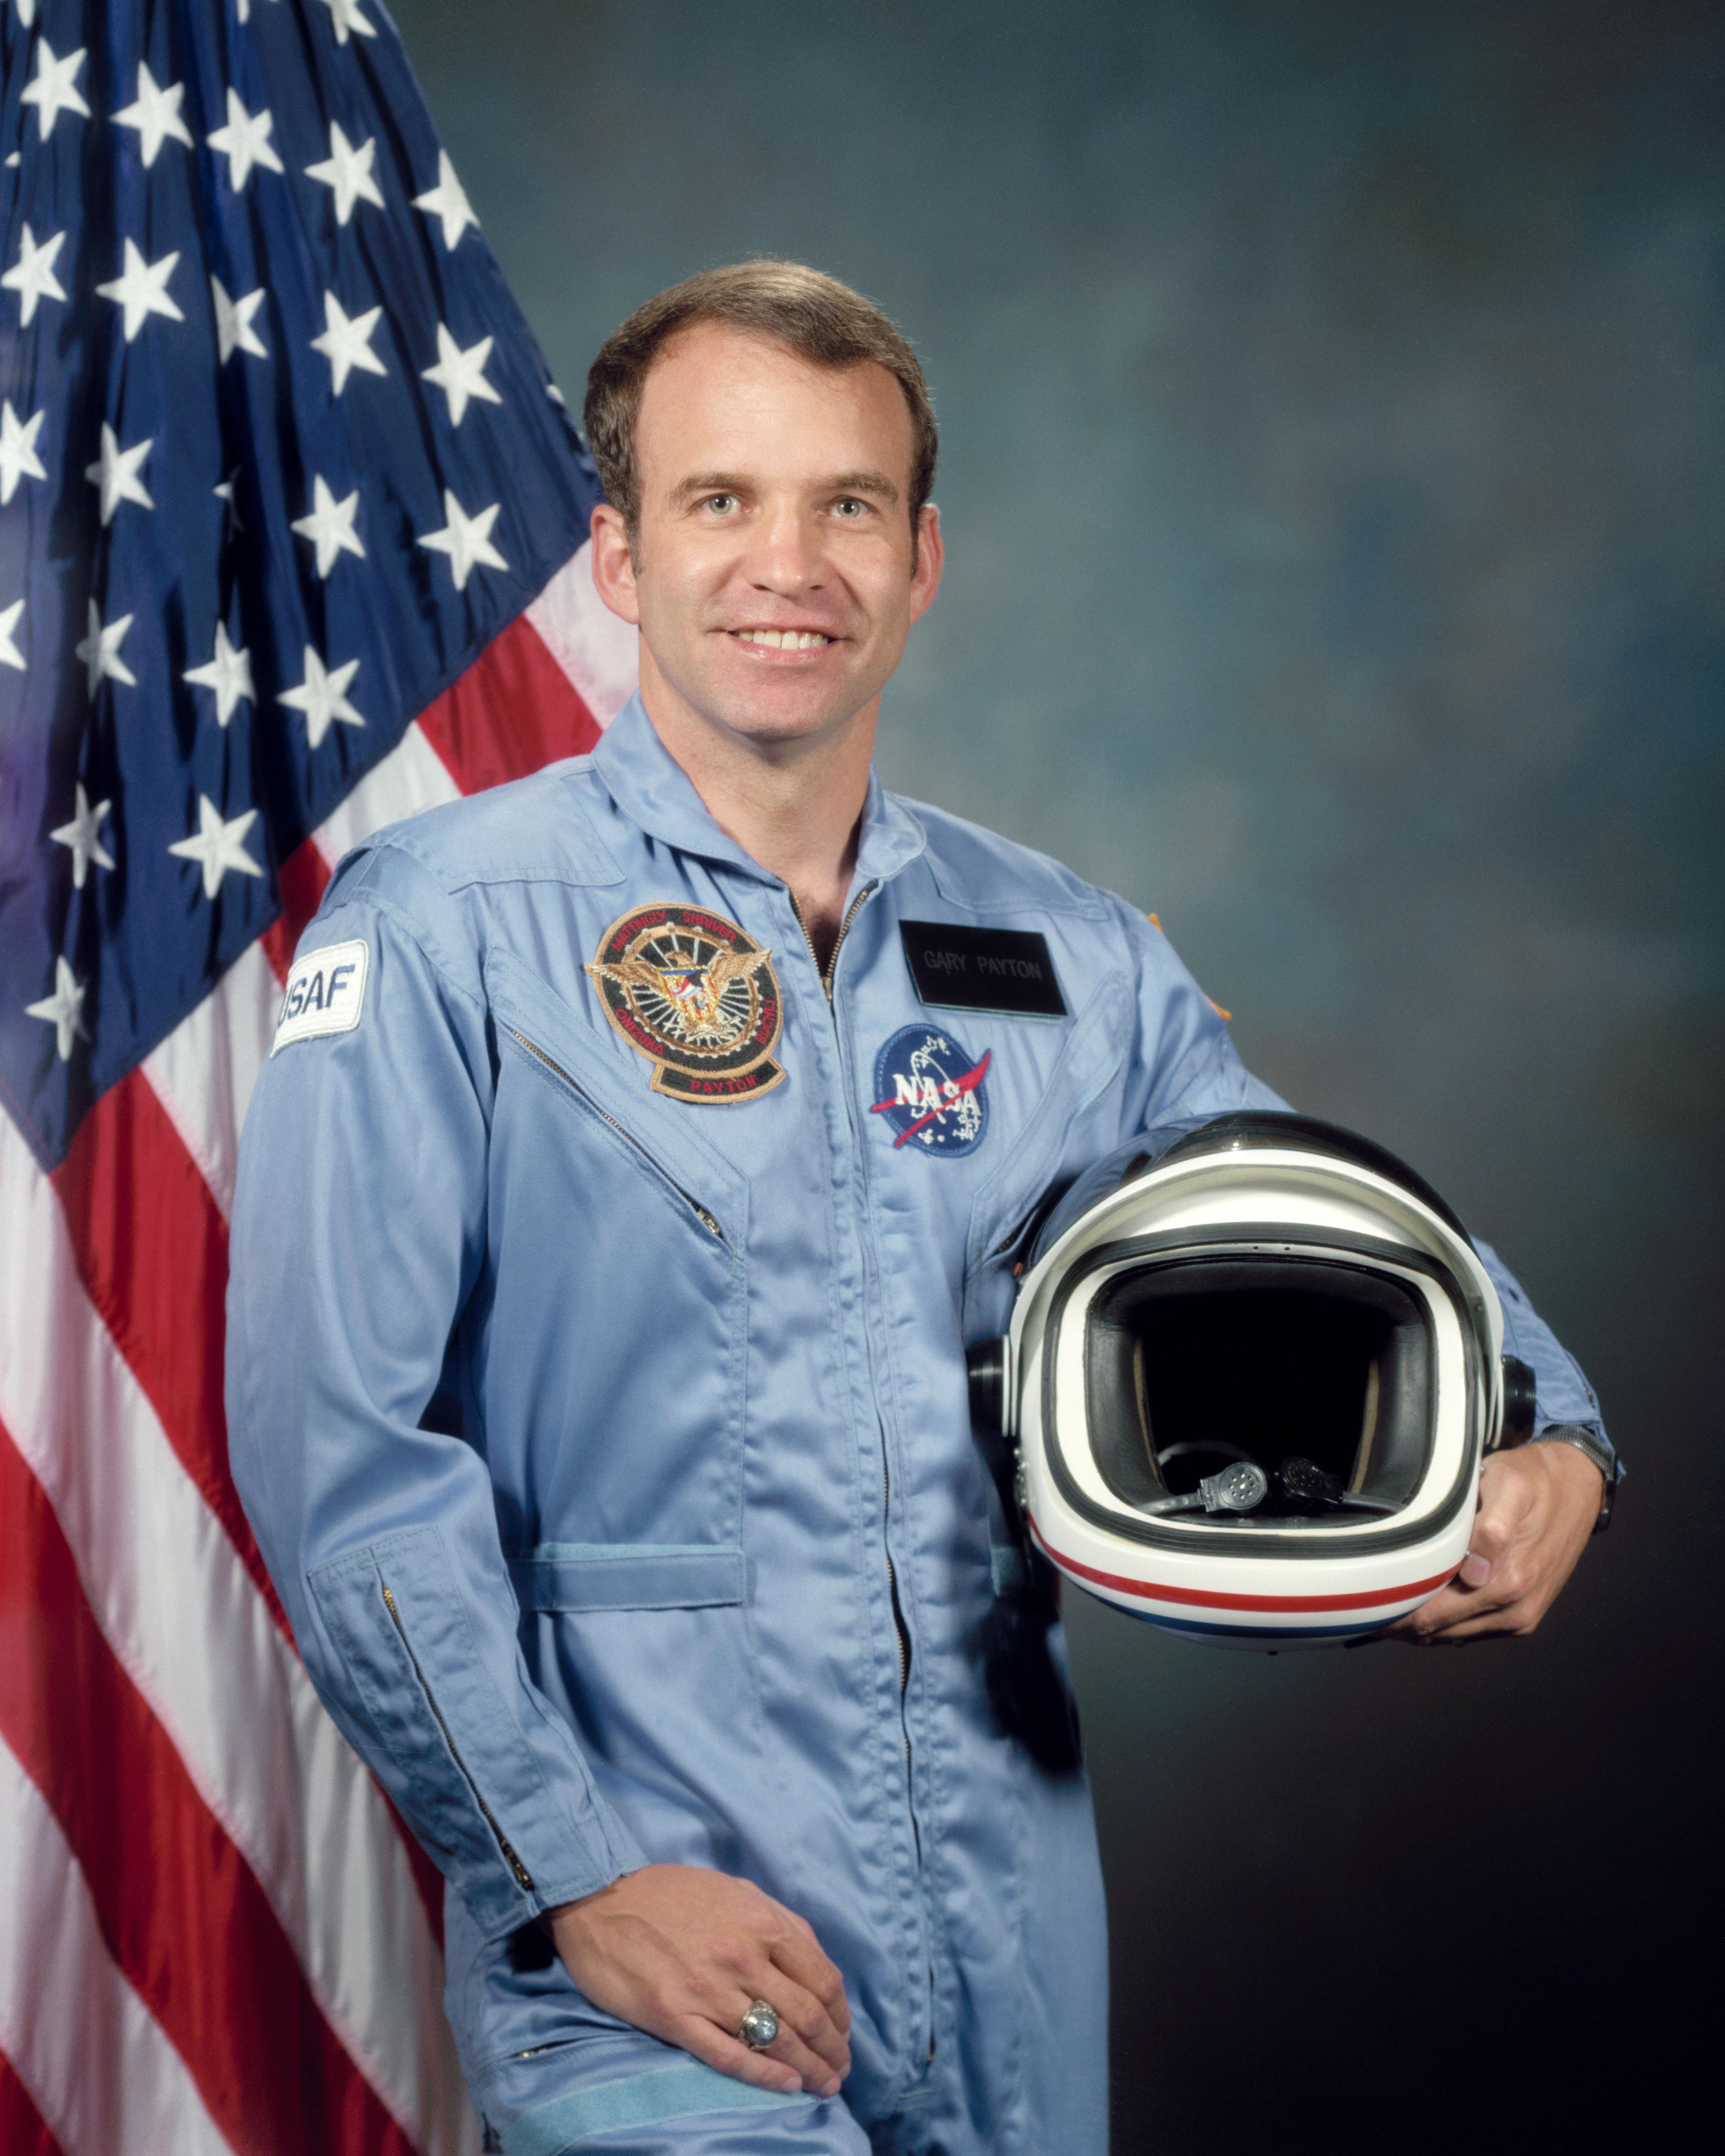 Astronaut Gary Payton, NASA photo (1984)Source: Wikipedia (www.jsc.nasa.gov unavailable June 2019) Gary_Payton.jpg